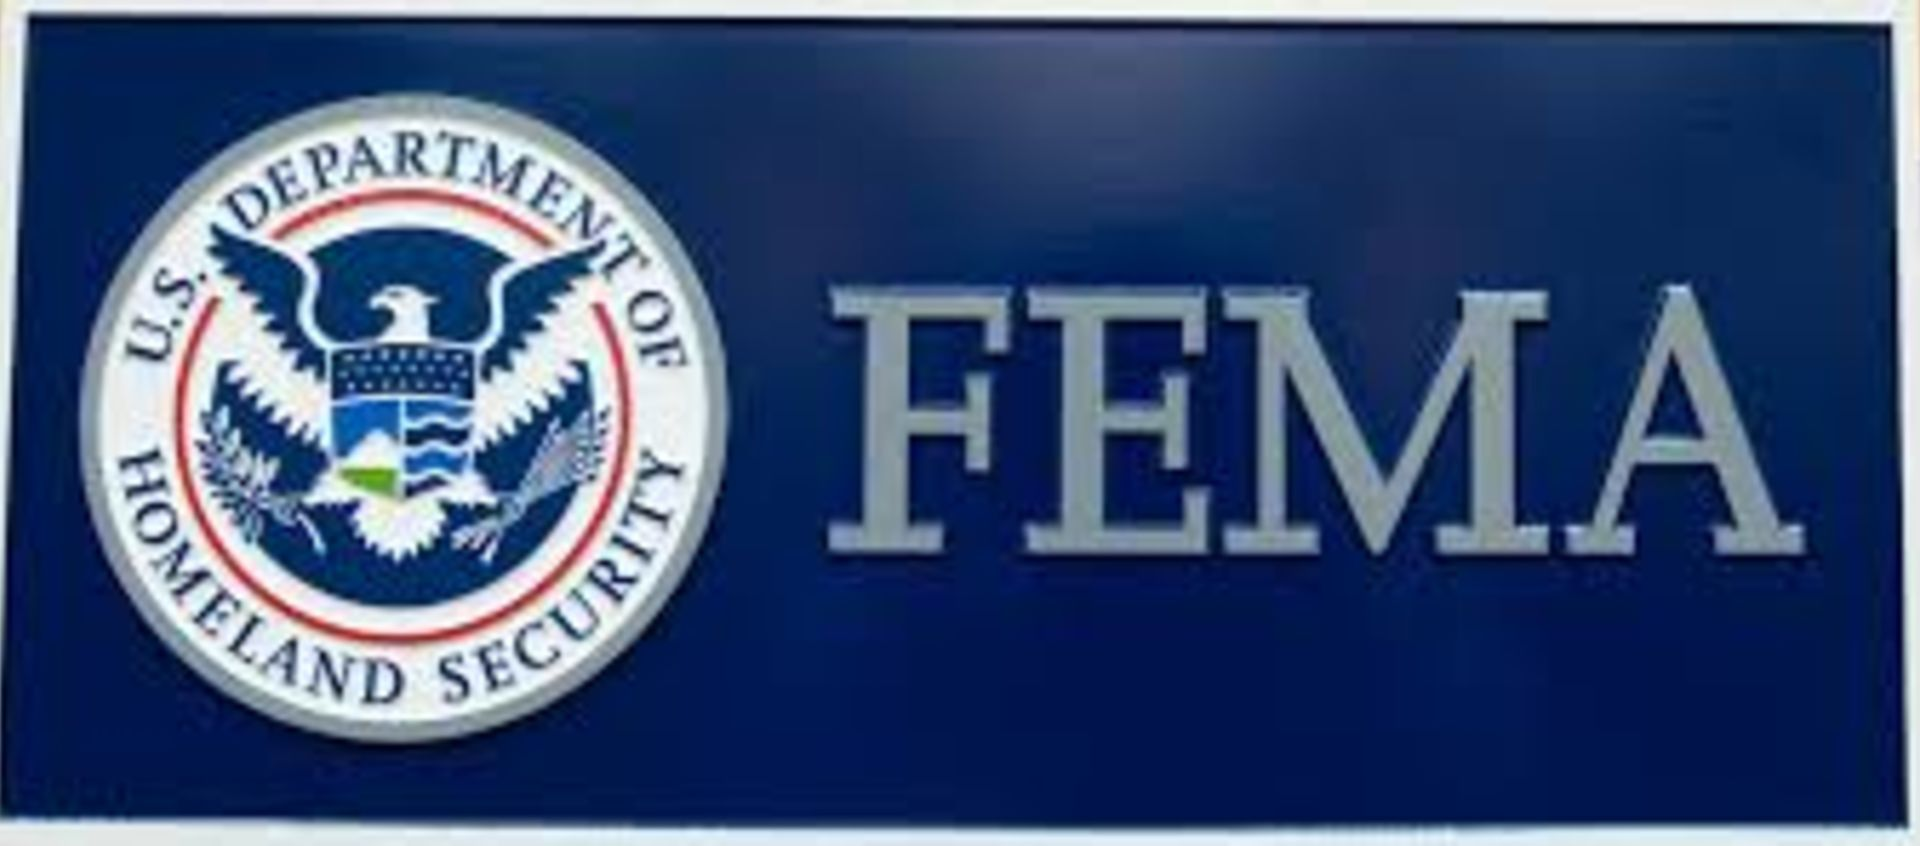 Dealing With FEMA